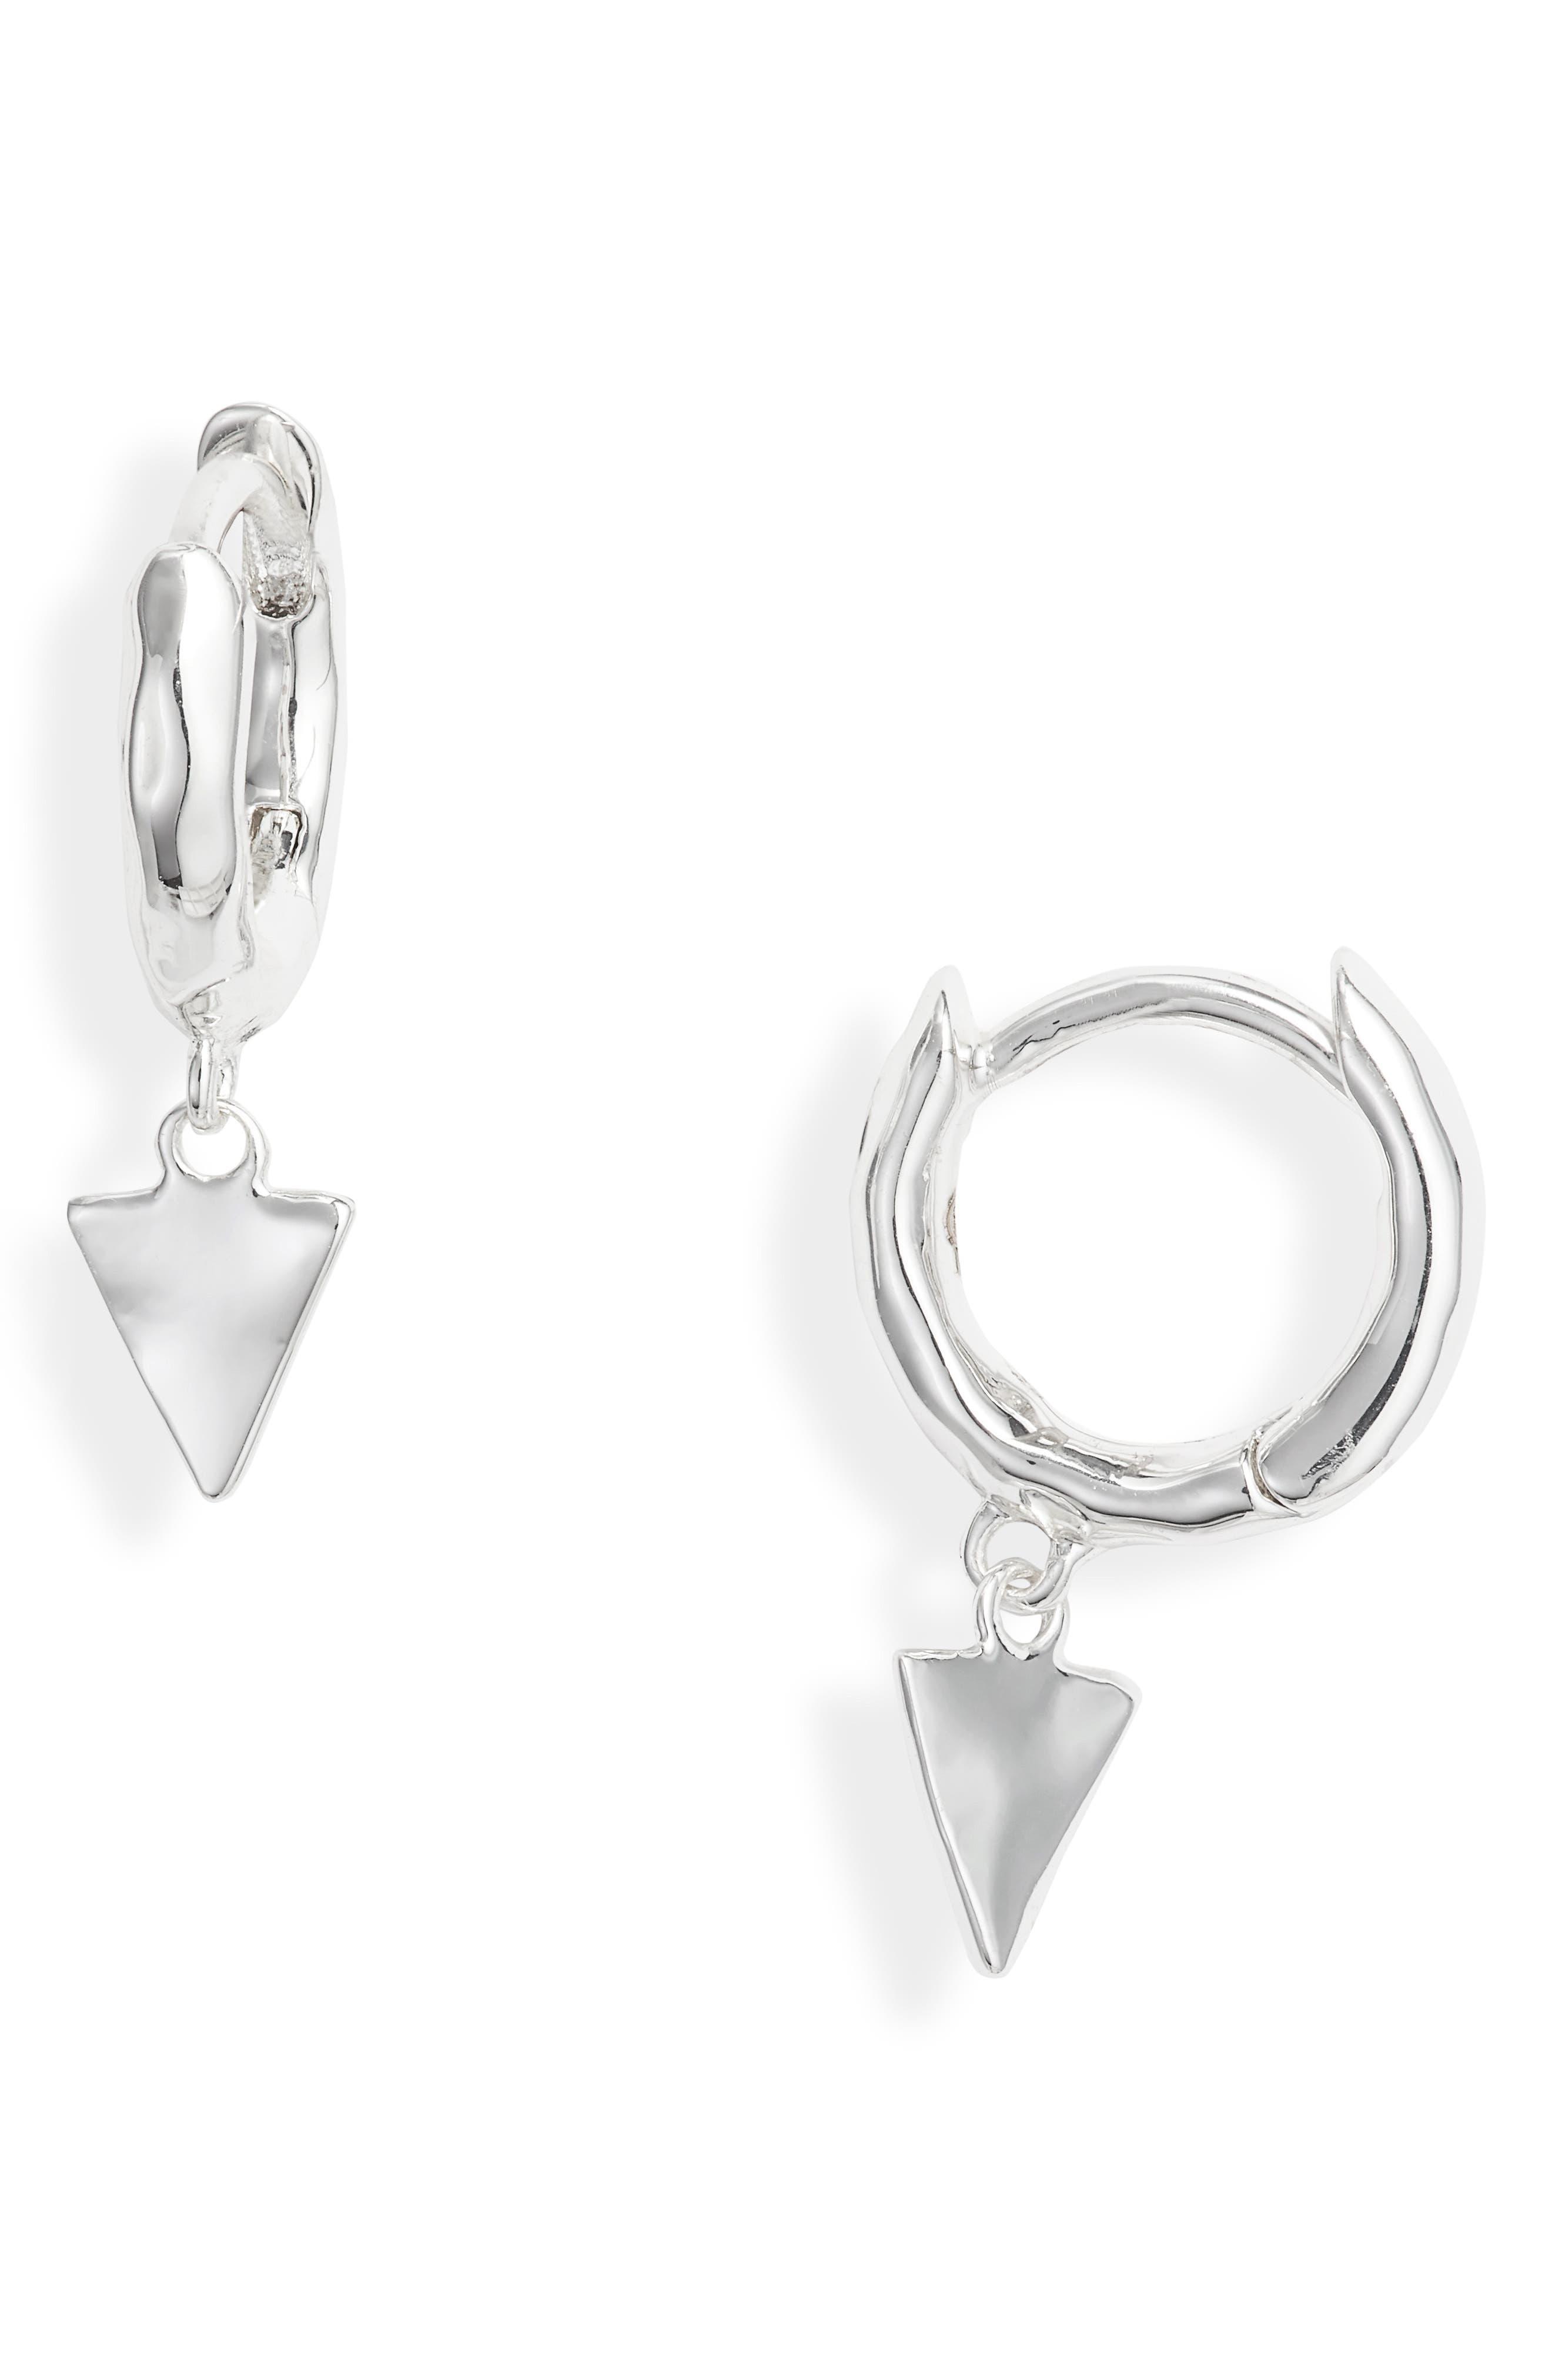 Luca Triangle Huggie Hoop Earrings,                             Main thumbnail 1, color,                             SILVER